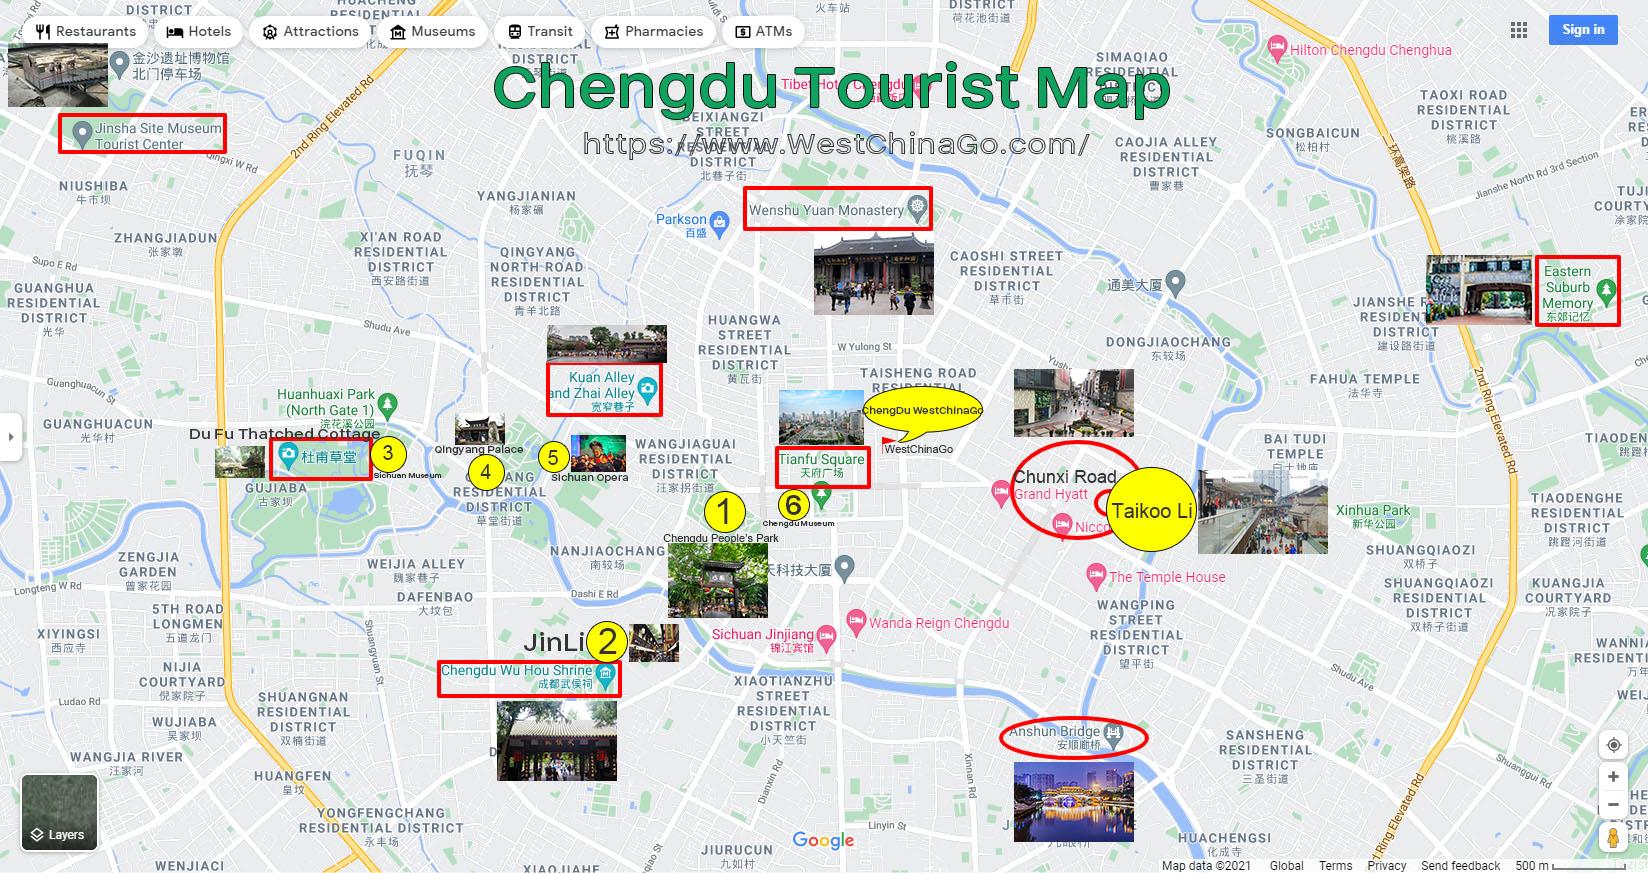 ChengDu tourist map